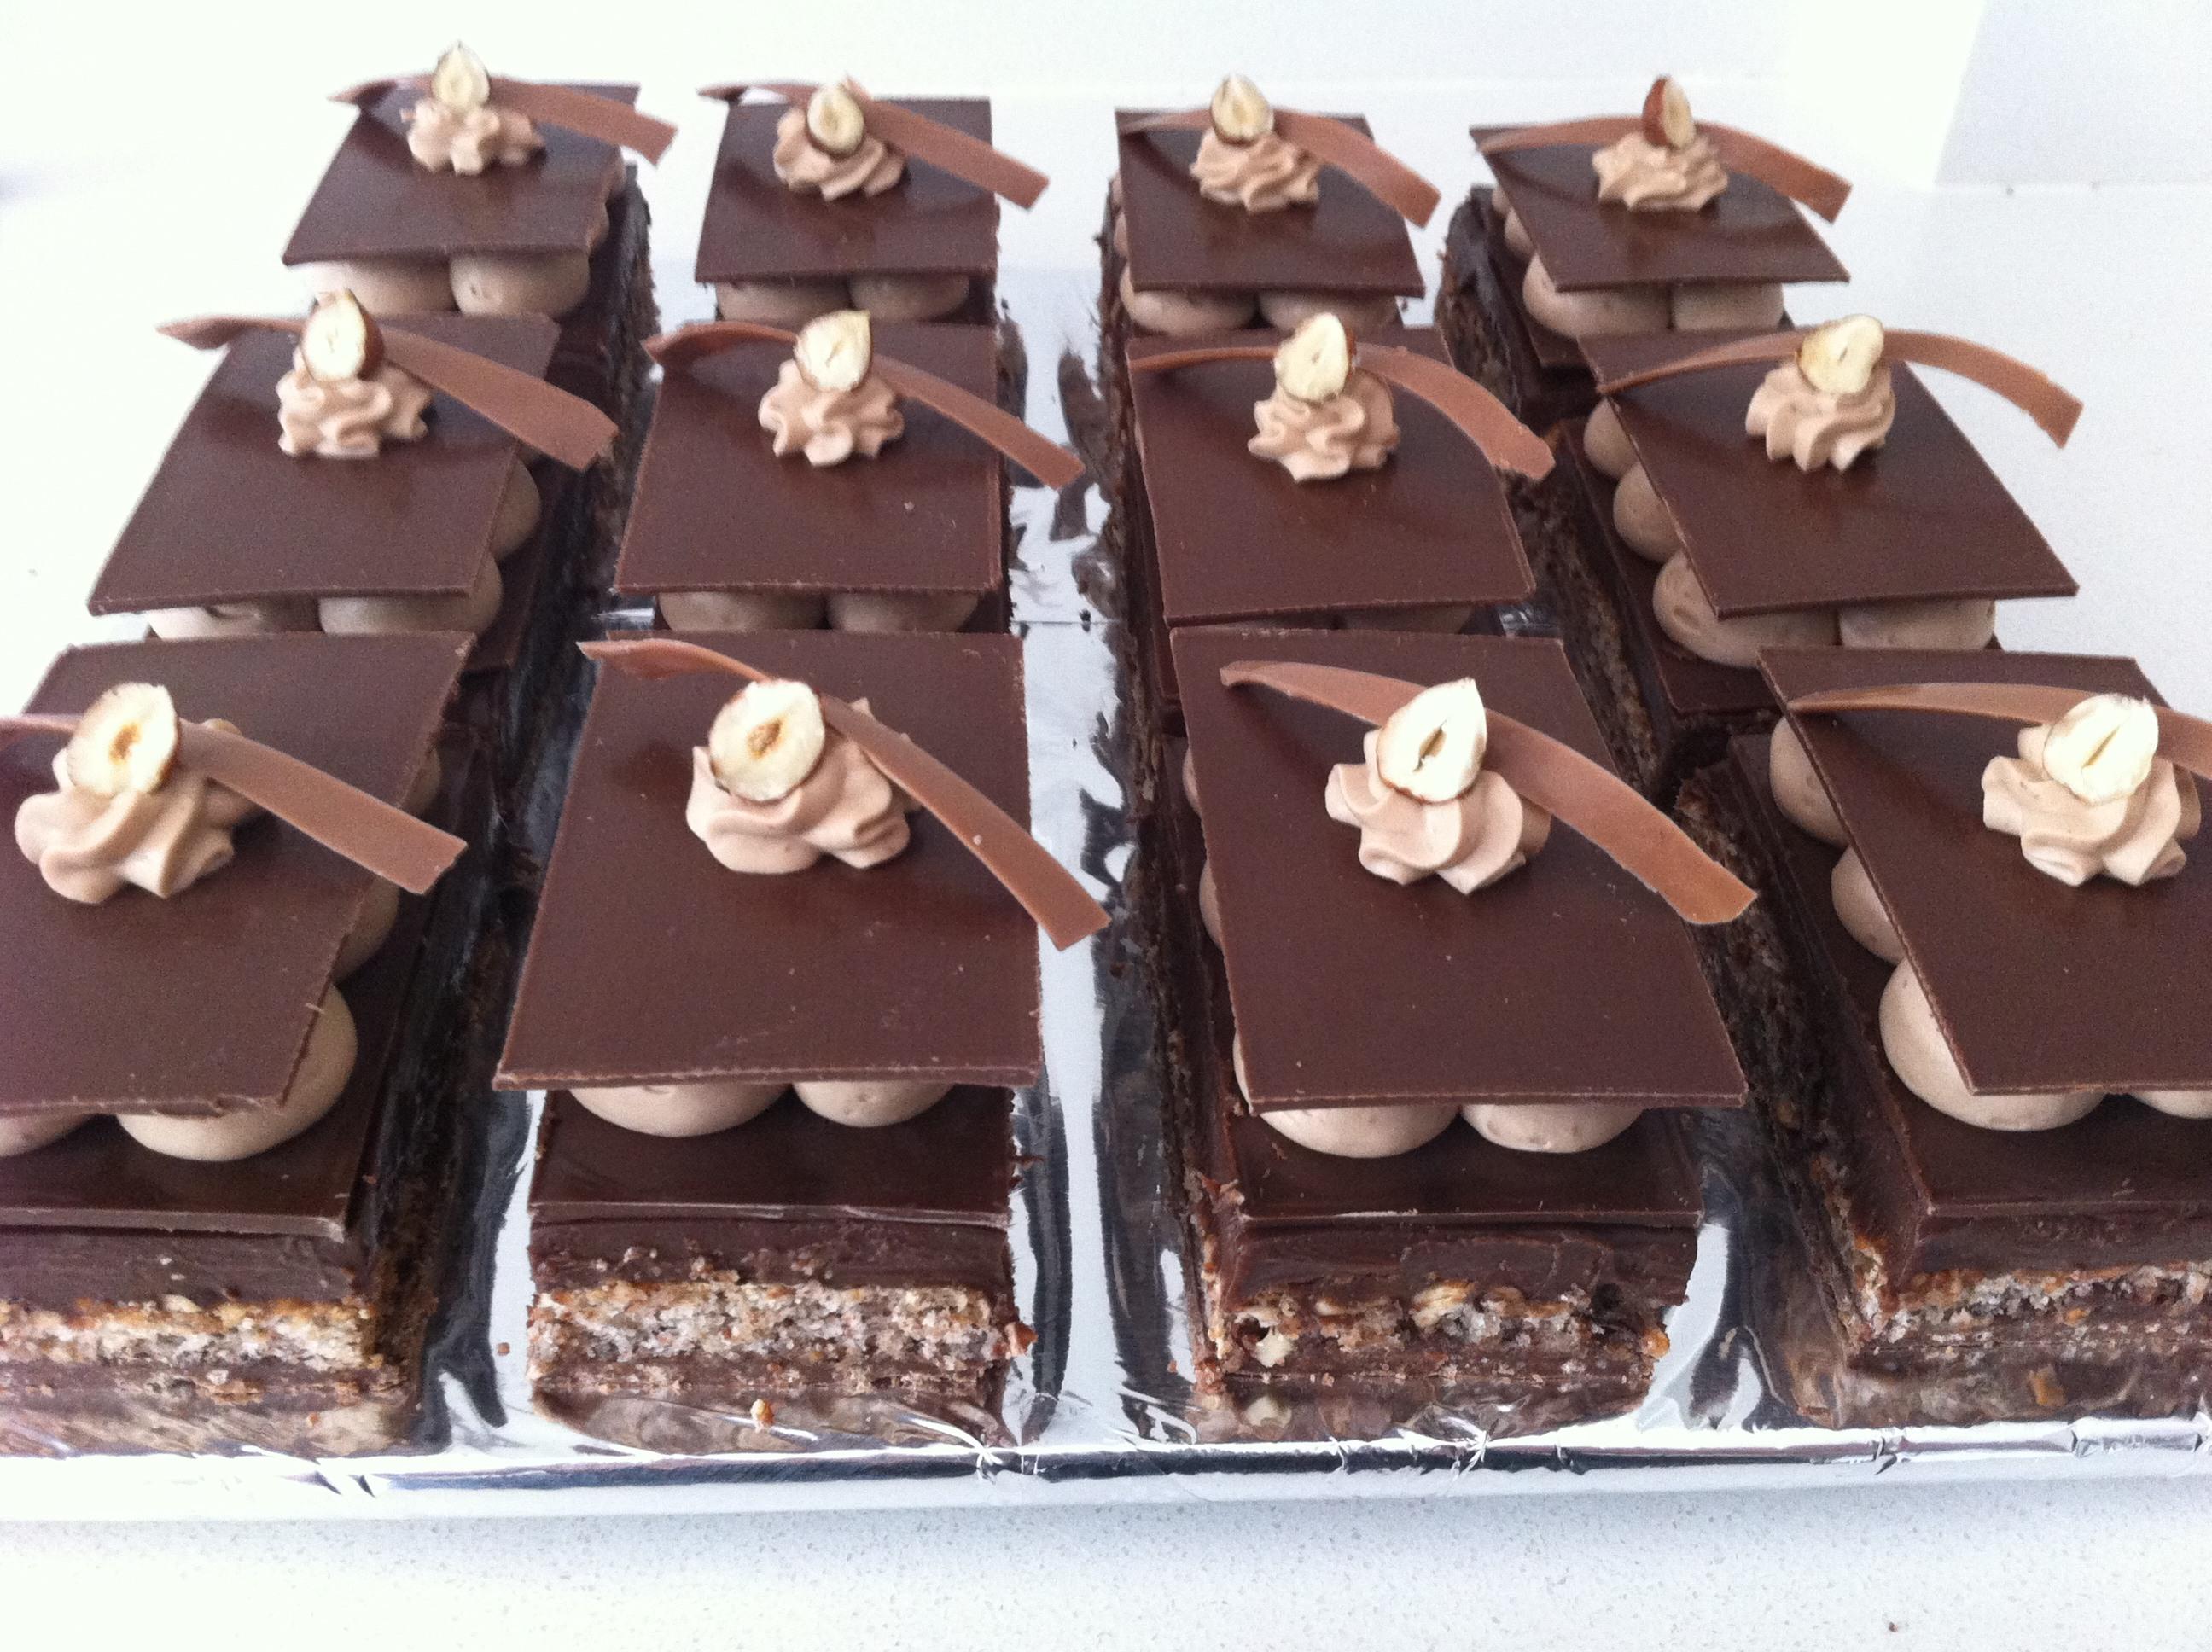 Howtocookthat Cakes Dessert Chocolate Perfect Sponge Cake